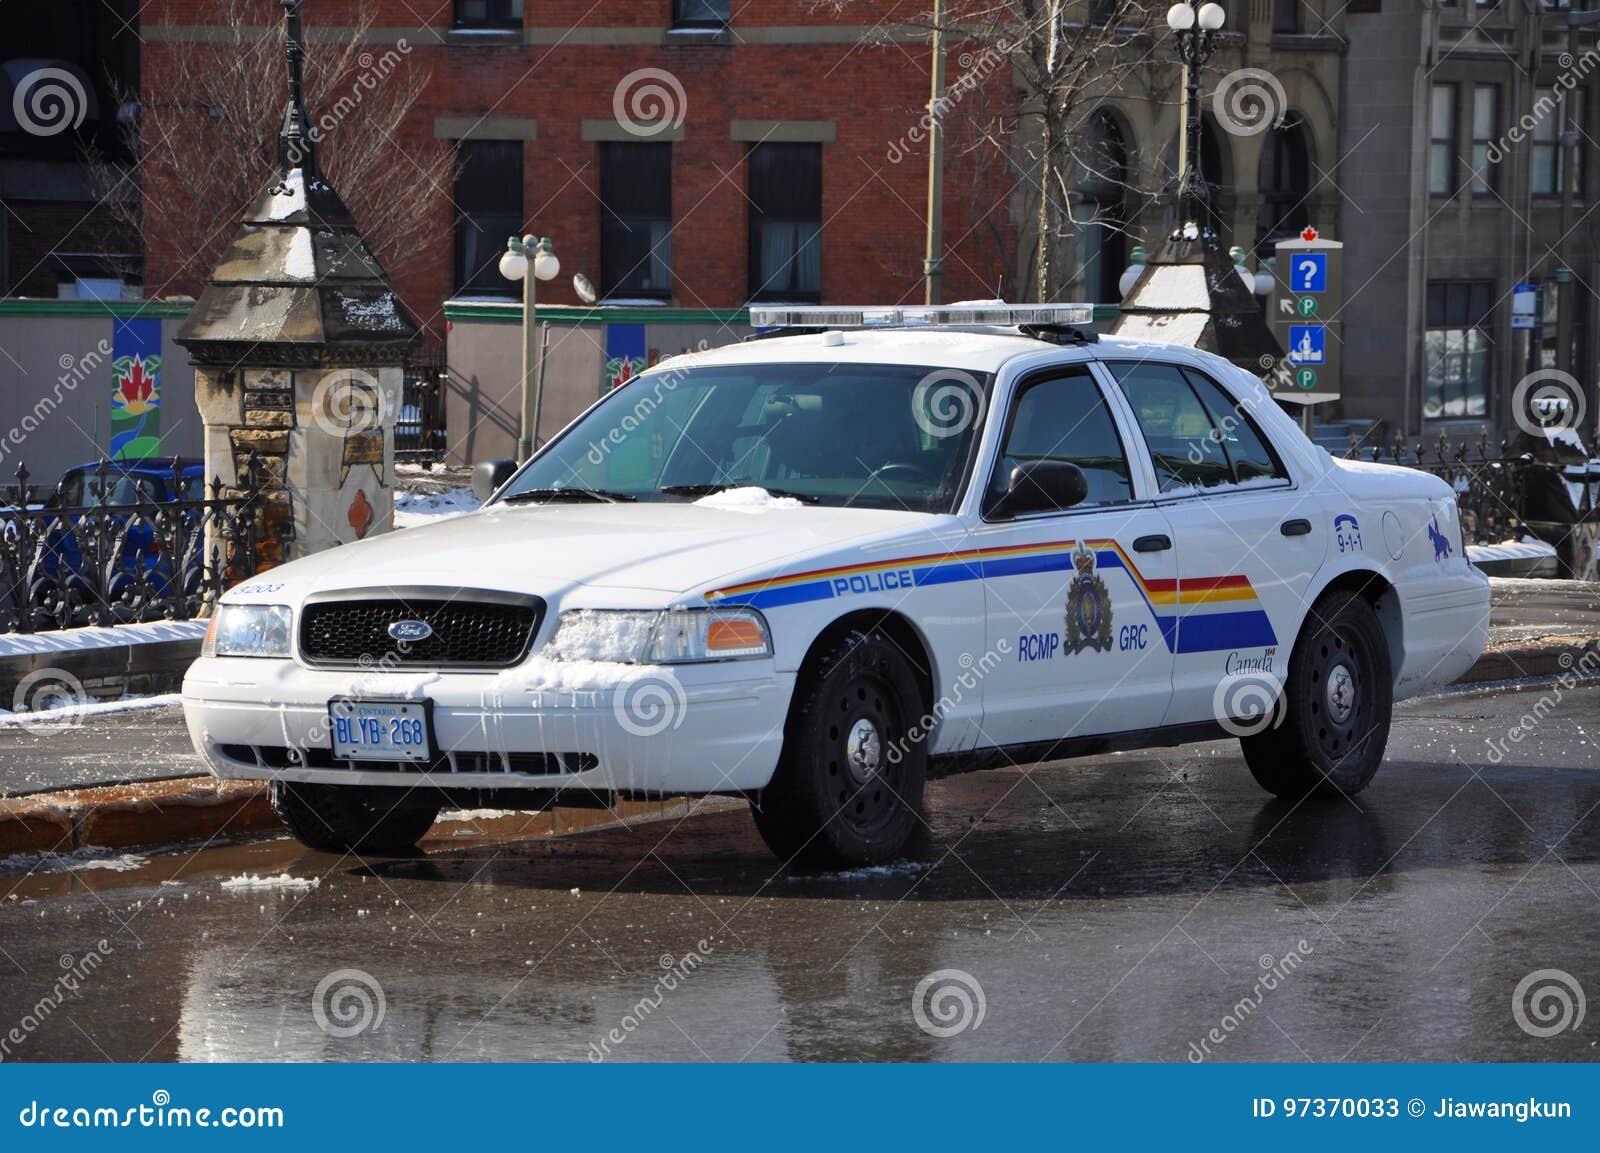 RCMP福特冠维多利亚警车在渥太华,加拿大